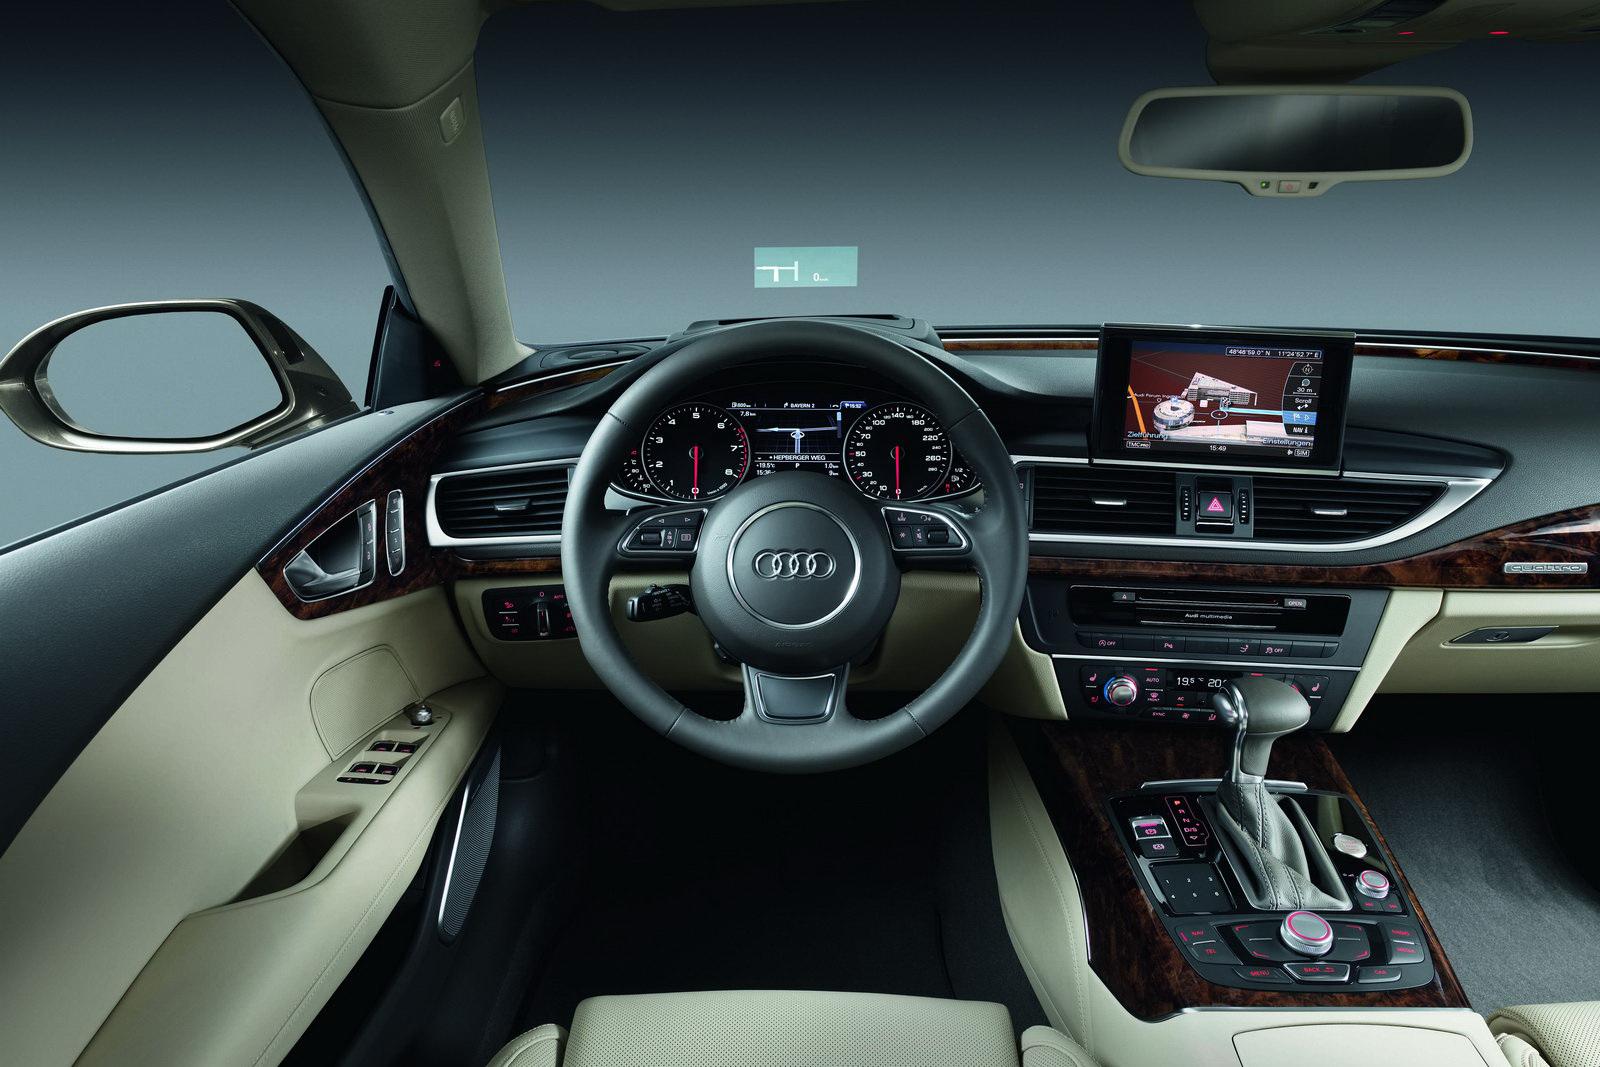 2011 Audi A7 Sportback Official Details and Photos ...